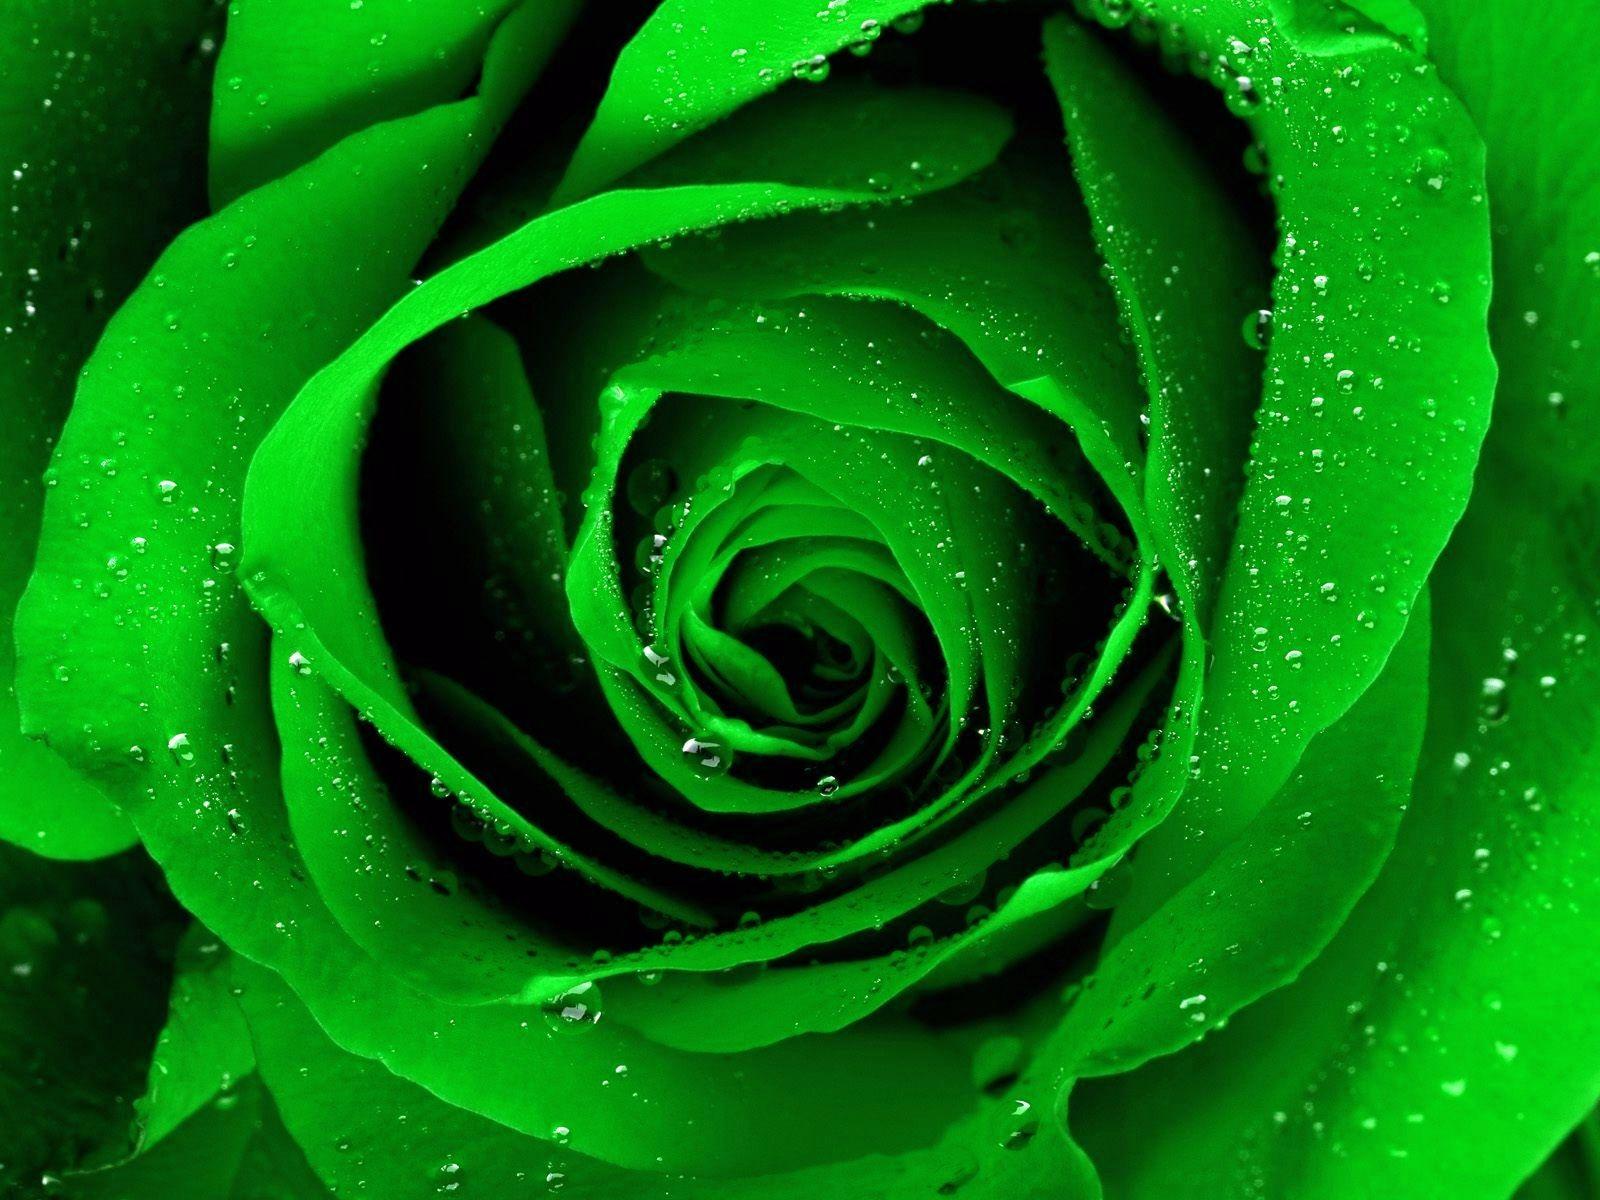 Green Roses wallpaper | 1600x1200 | #23149 | wedding | Pinterest ...